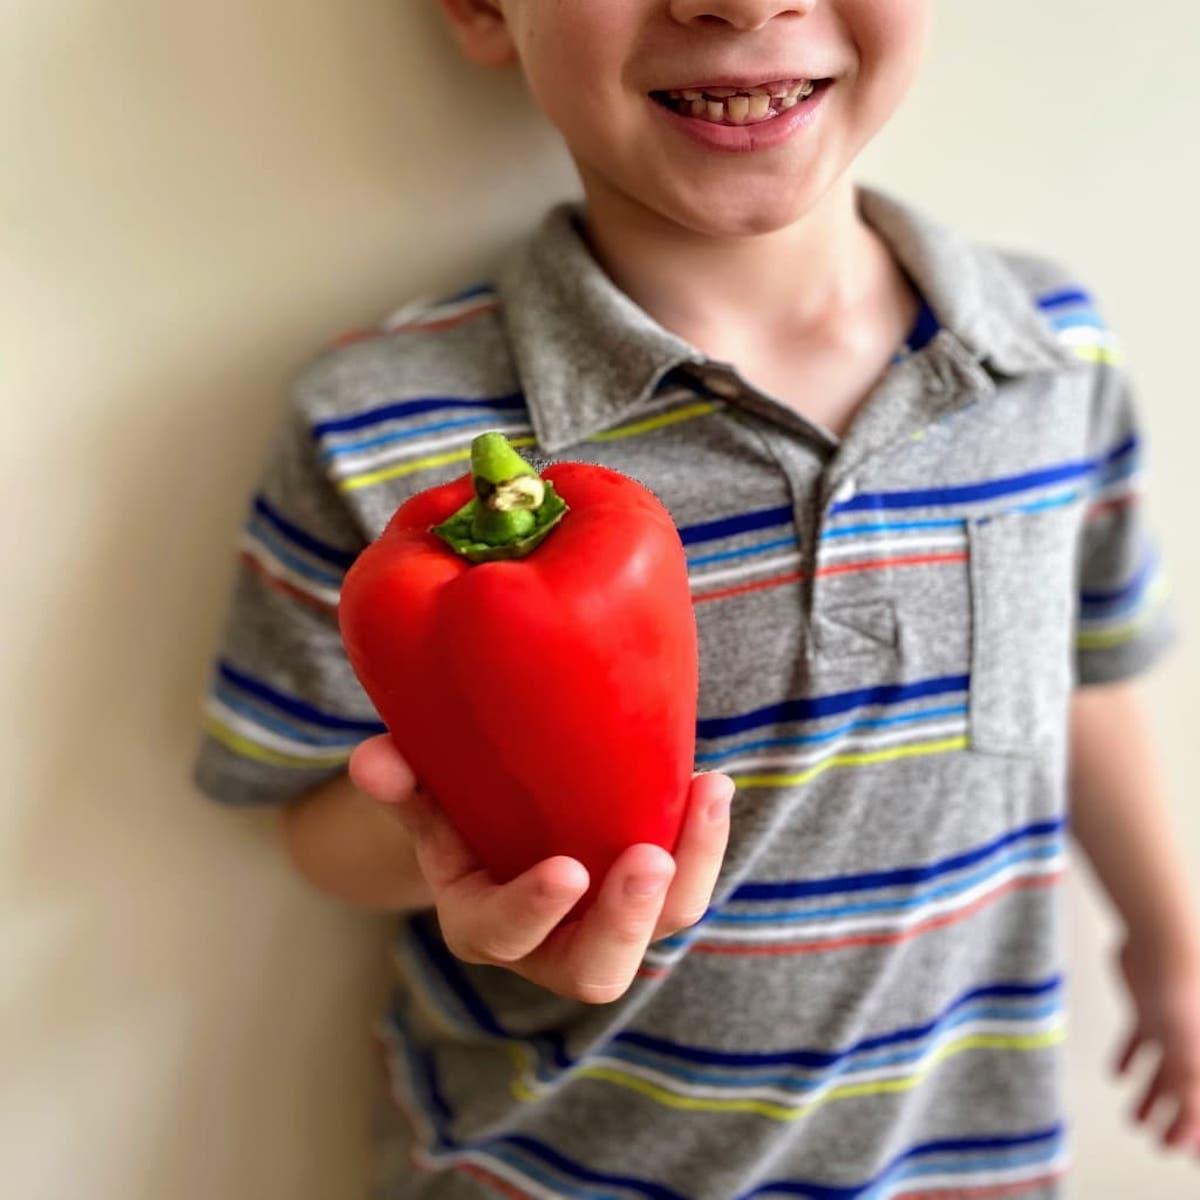 boy holding red bell pepper